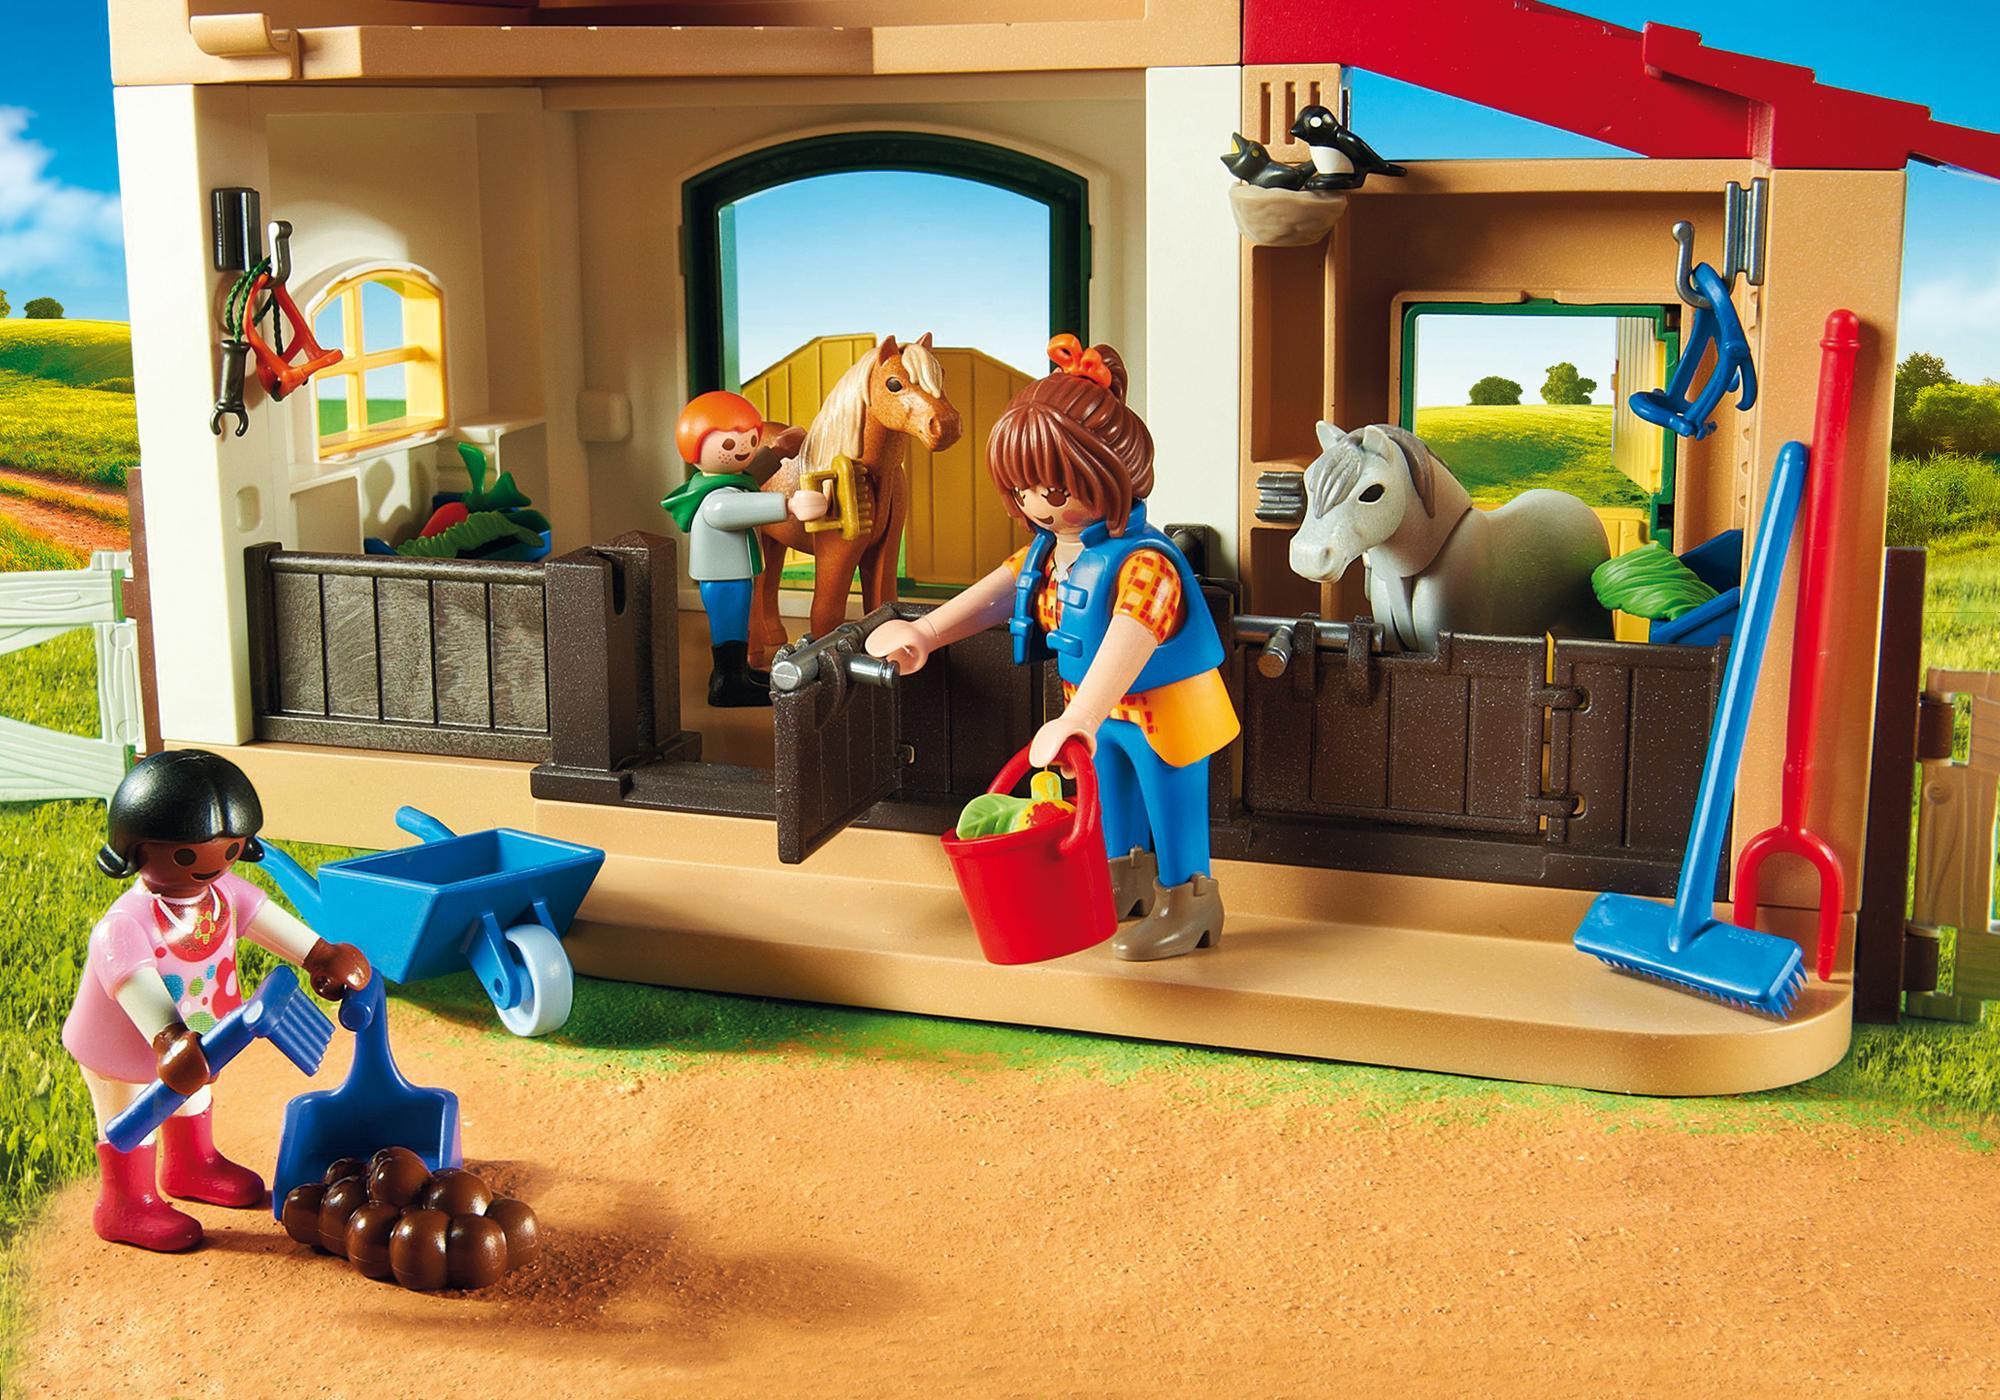 http://media.playmobil.com/i/playmobil/6927_product_extra3/Maneggio dei Pony